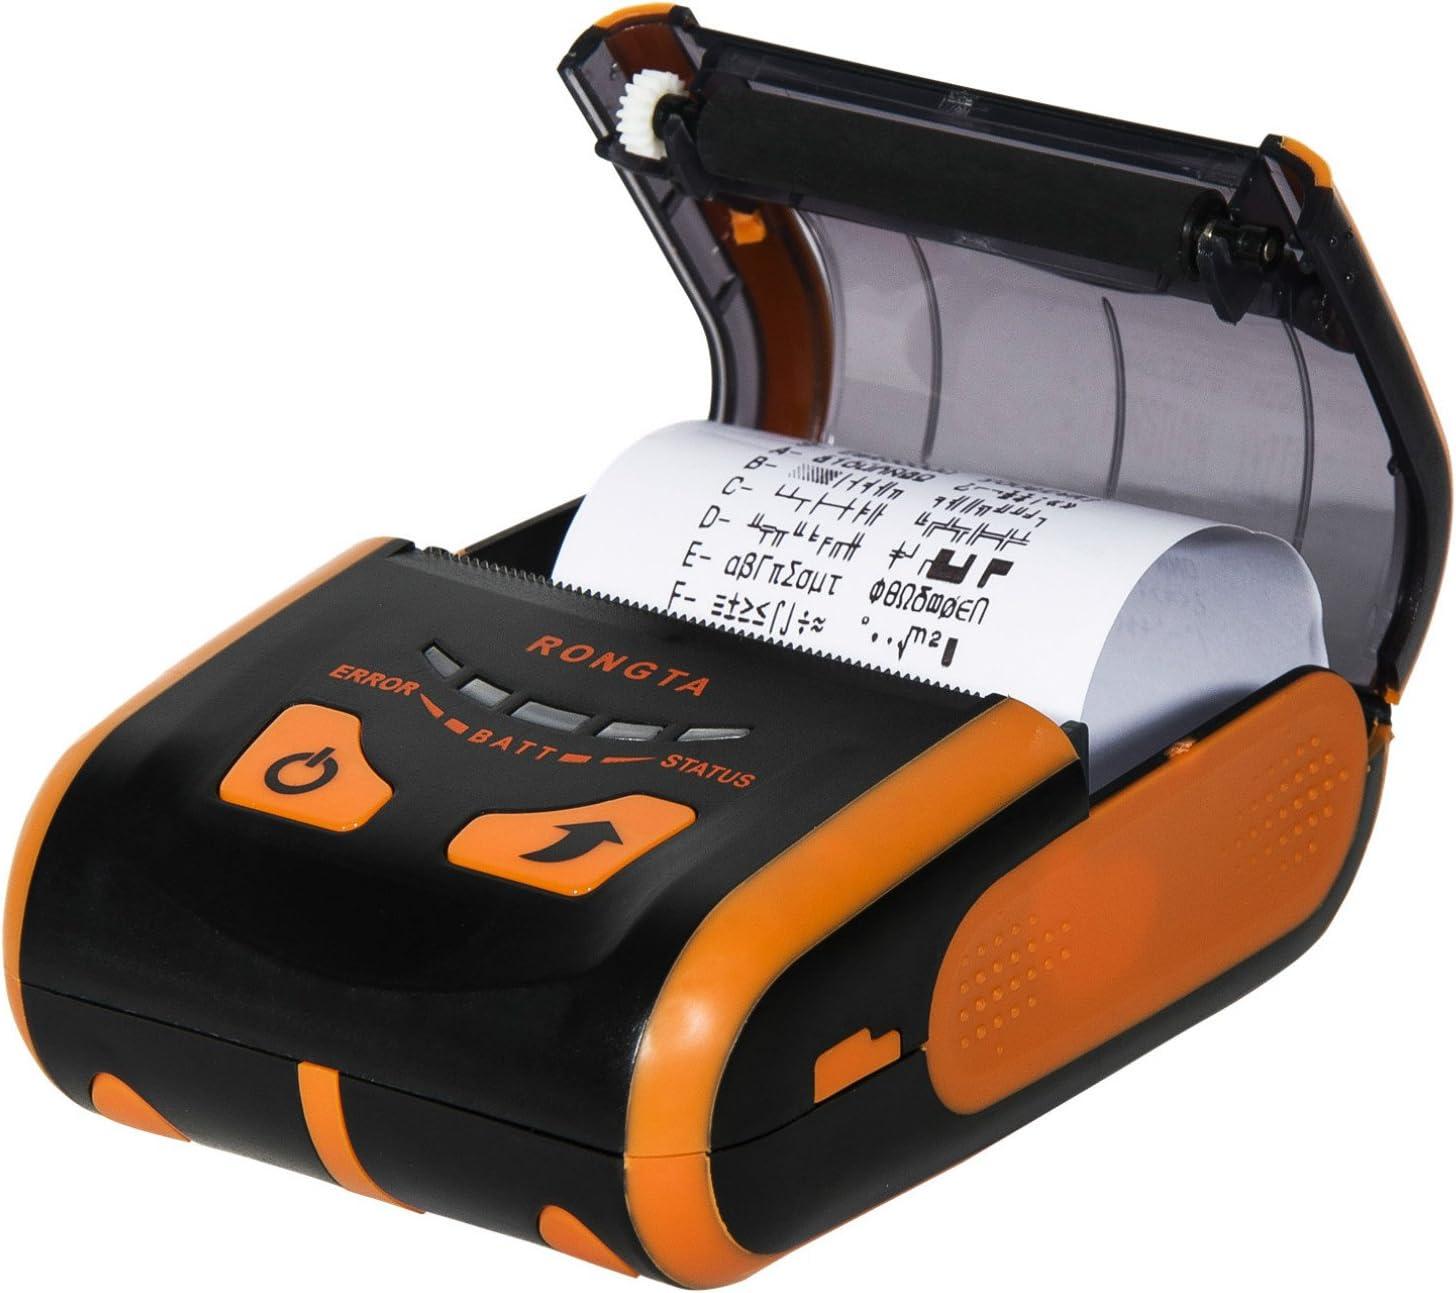 Amazon.com: rongta rpp300 80 mm. Mini portátil Bluetooth ...